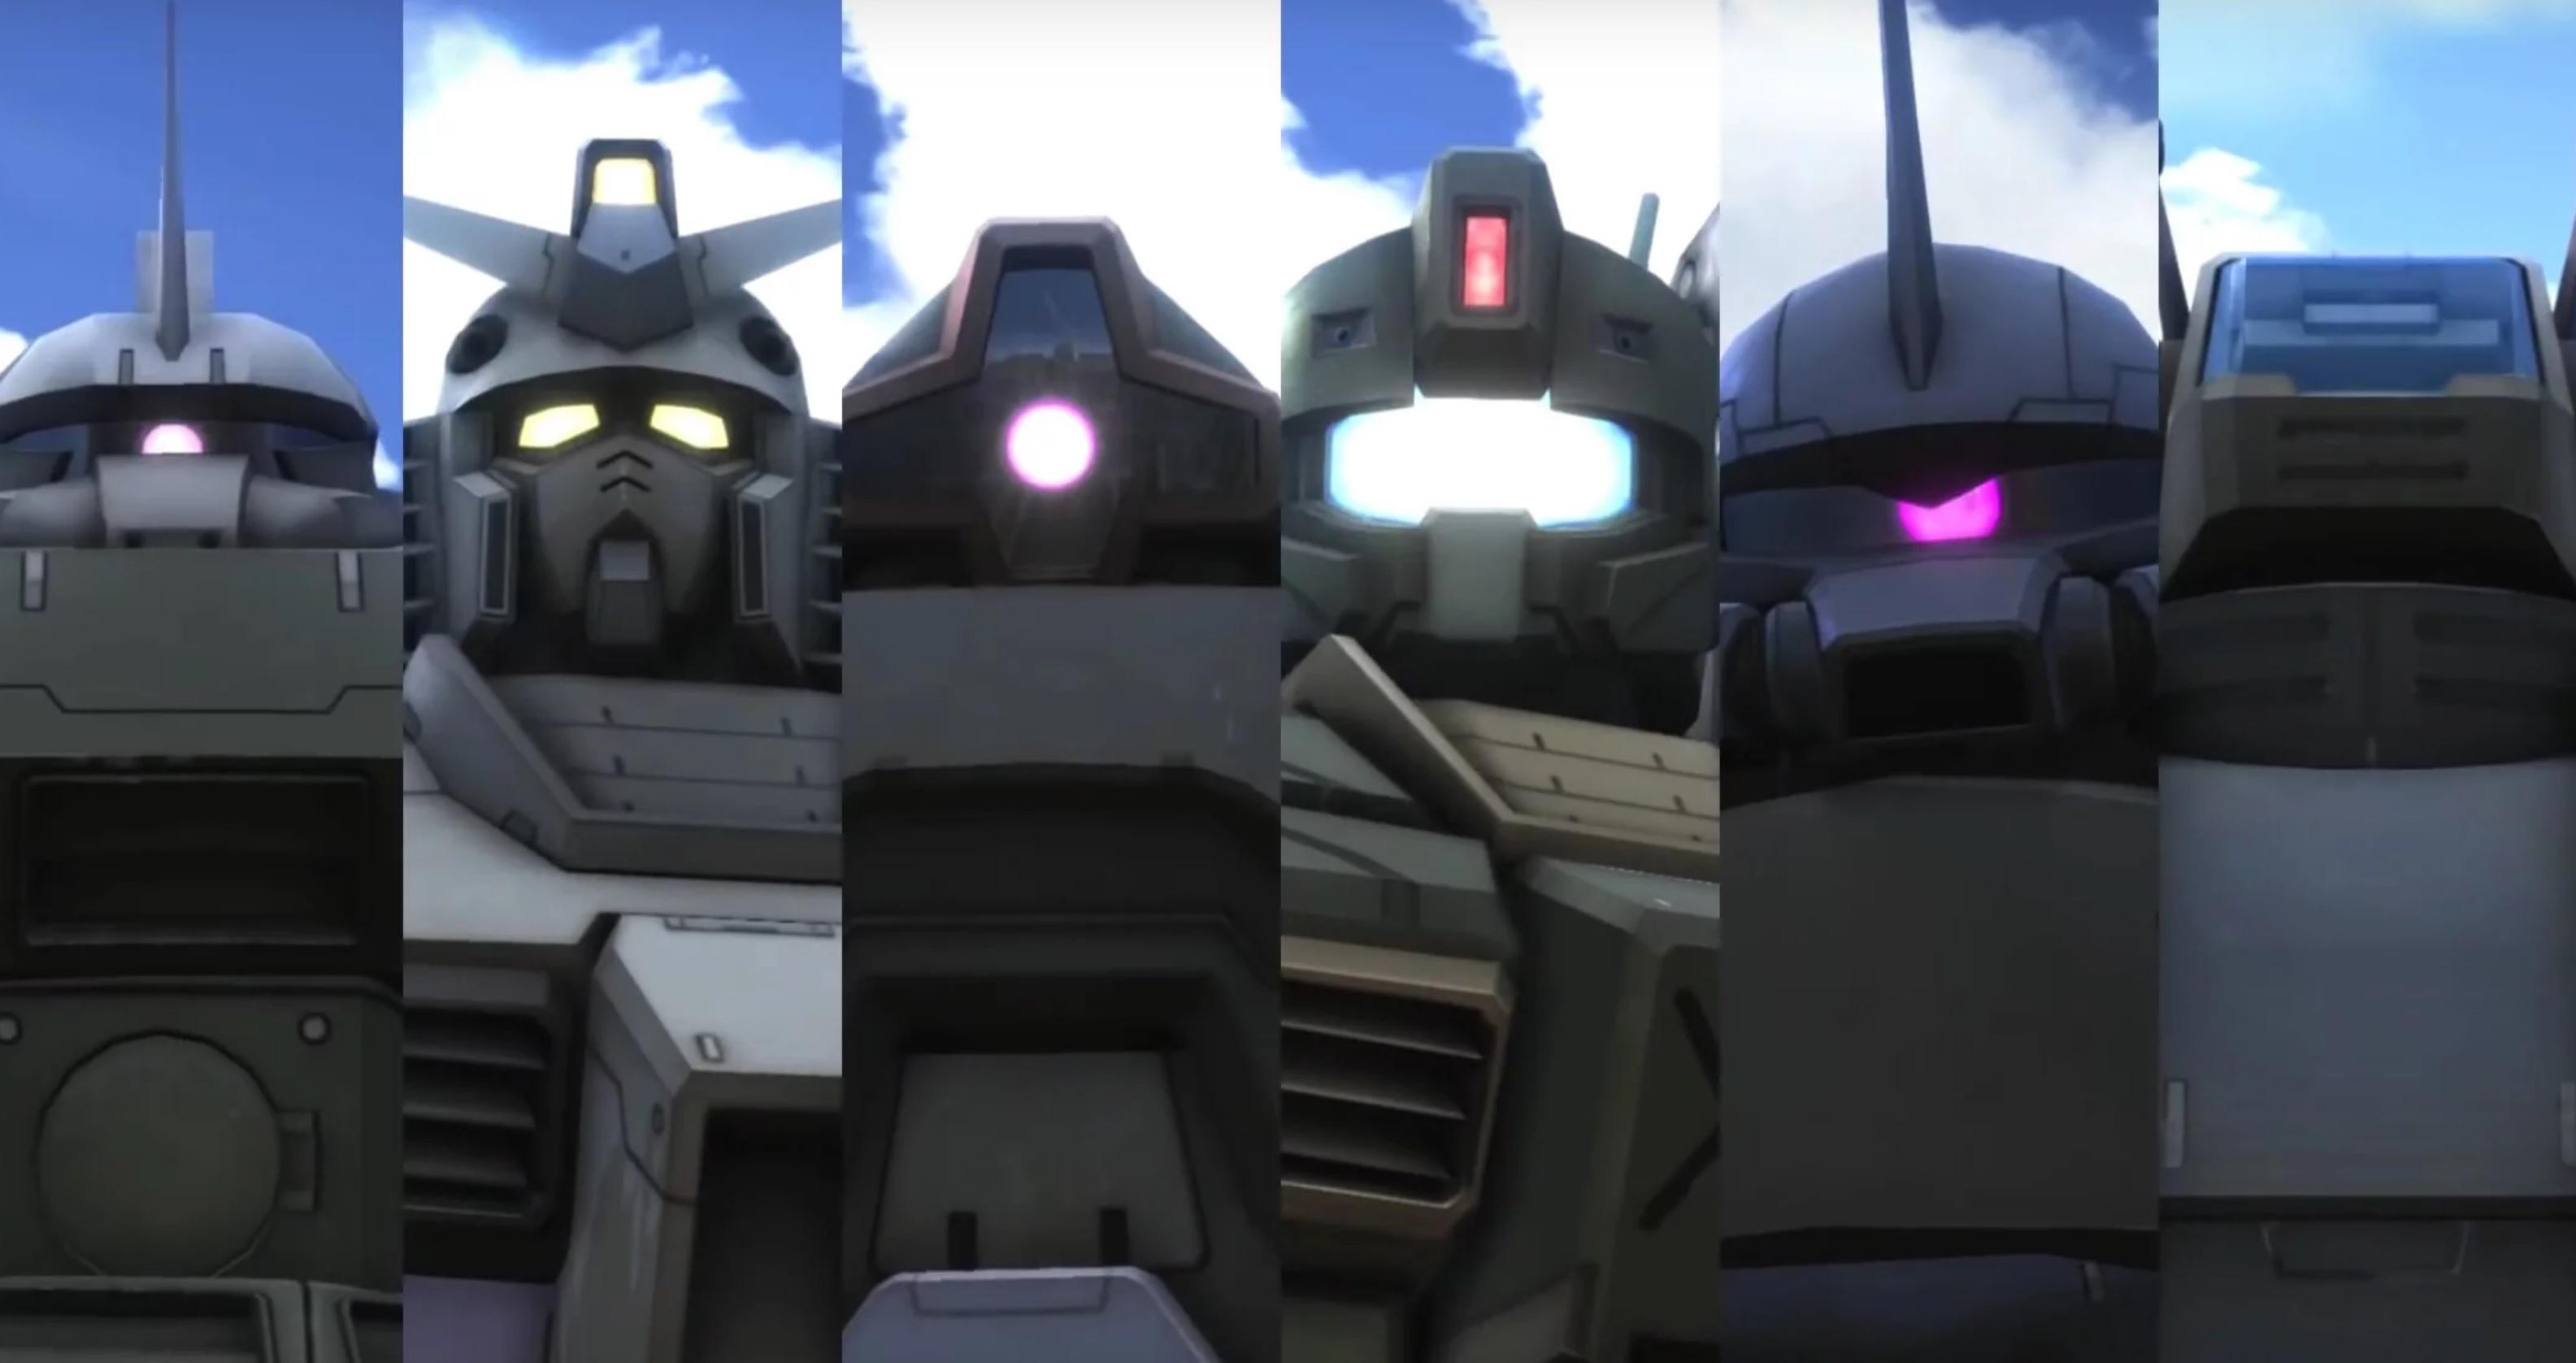 Review: Mobile Suit Gundam: Battle Operation 2 screenshot